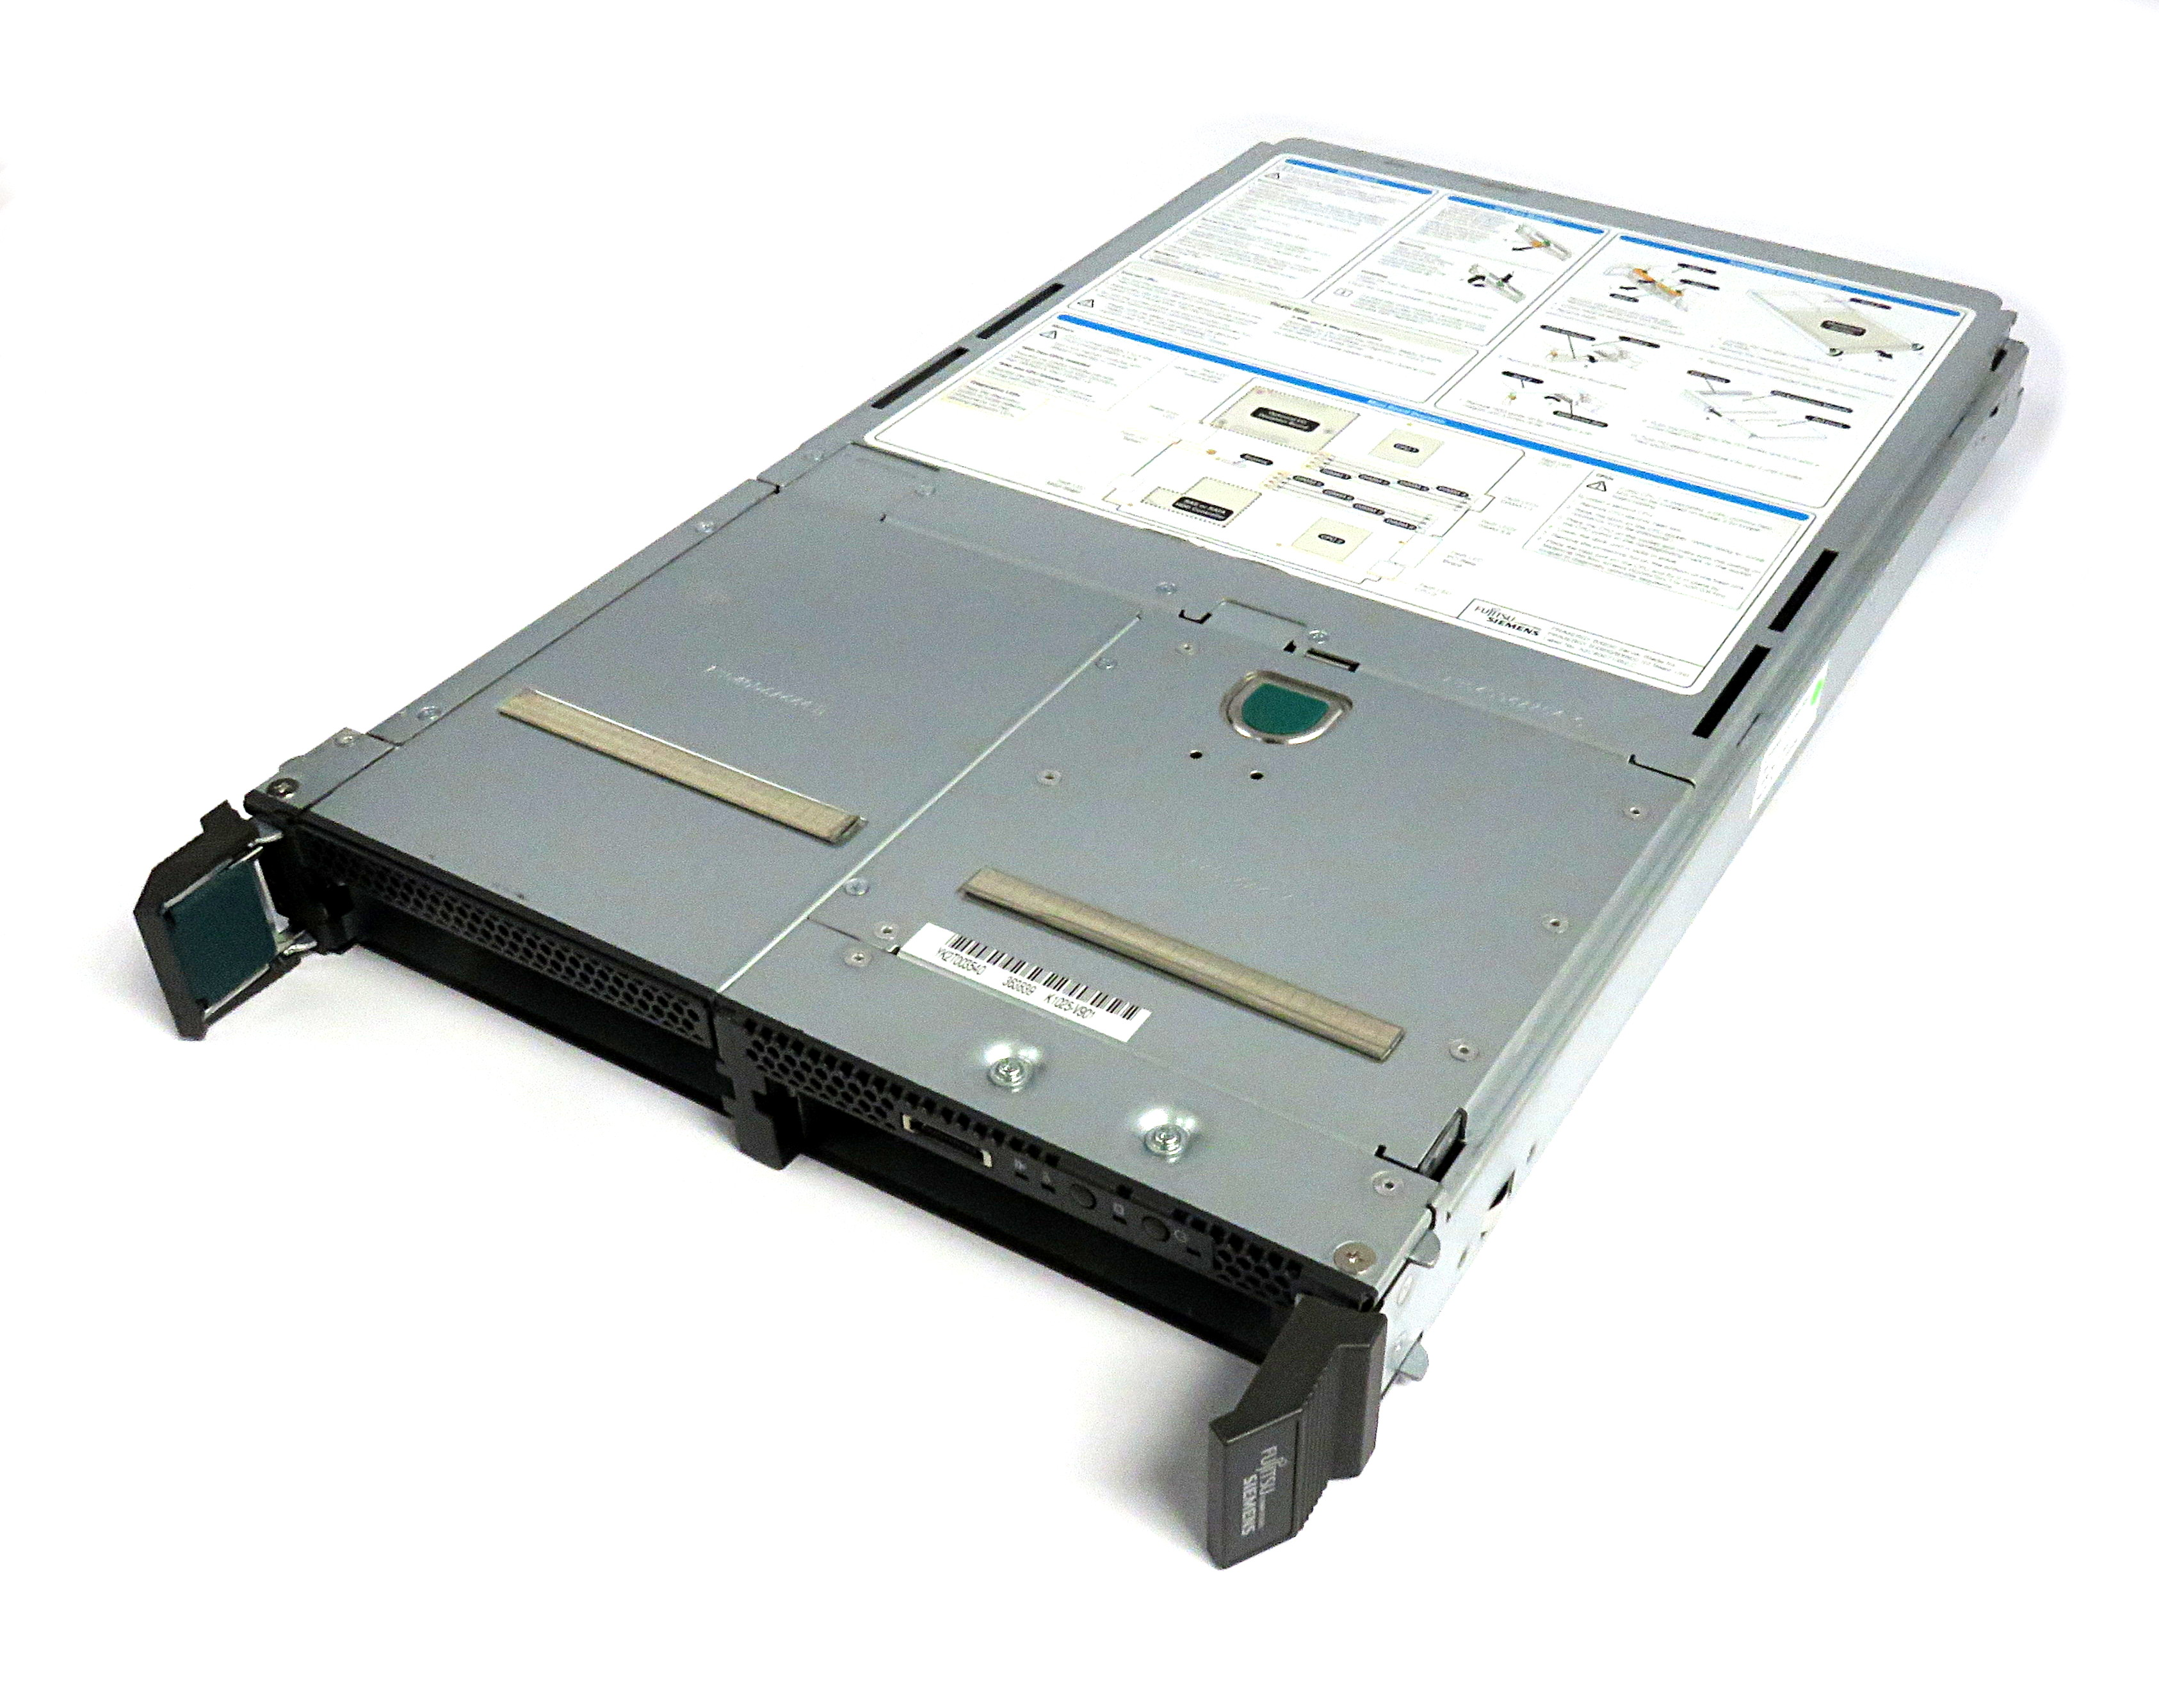 Fujitsu Siemens S26361-K1025-V901 Primergy BX630 Server Blade